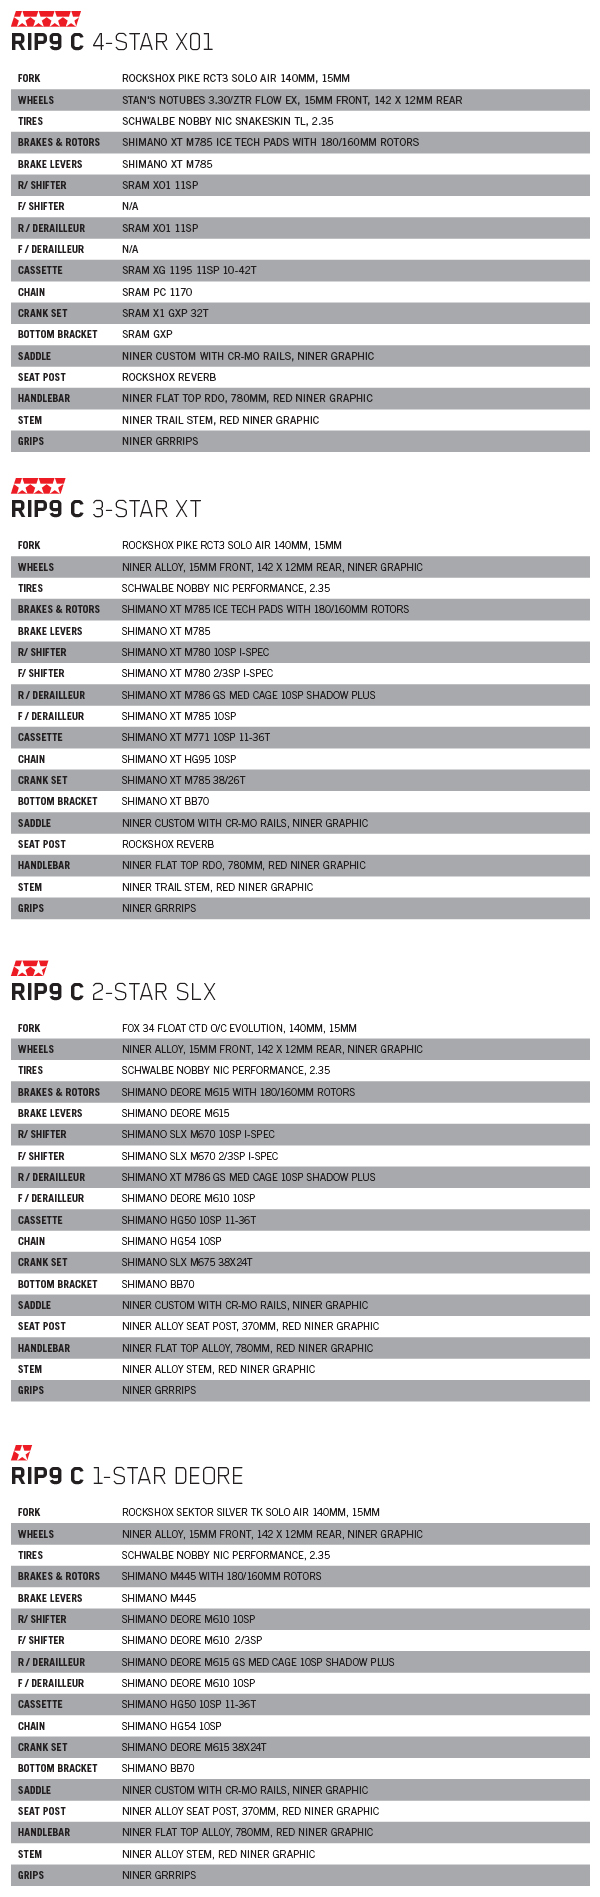 2015-01-15 rip 9 carbon 2